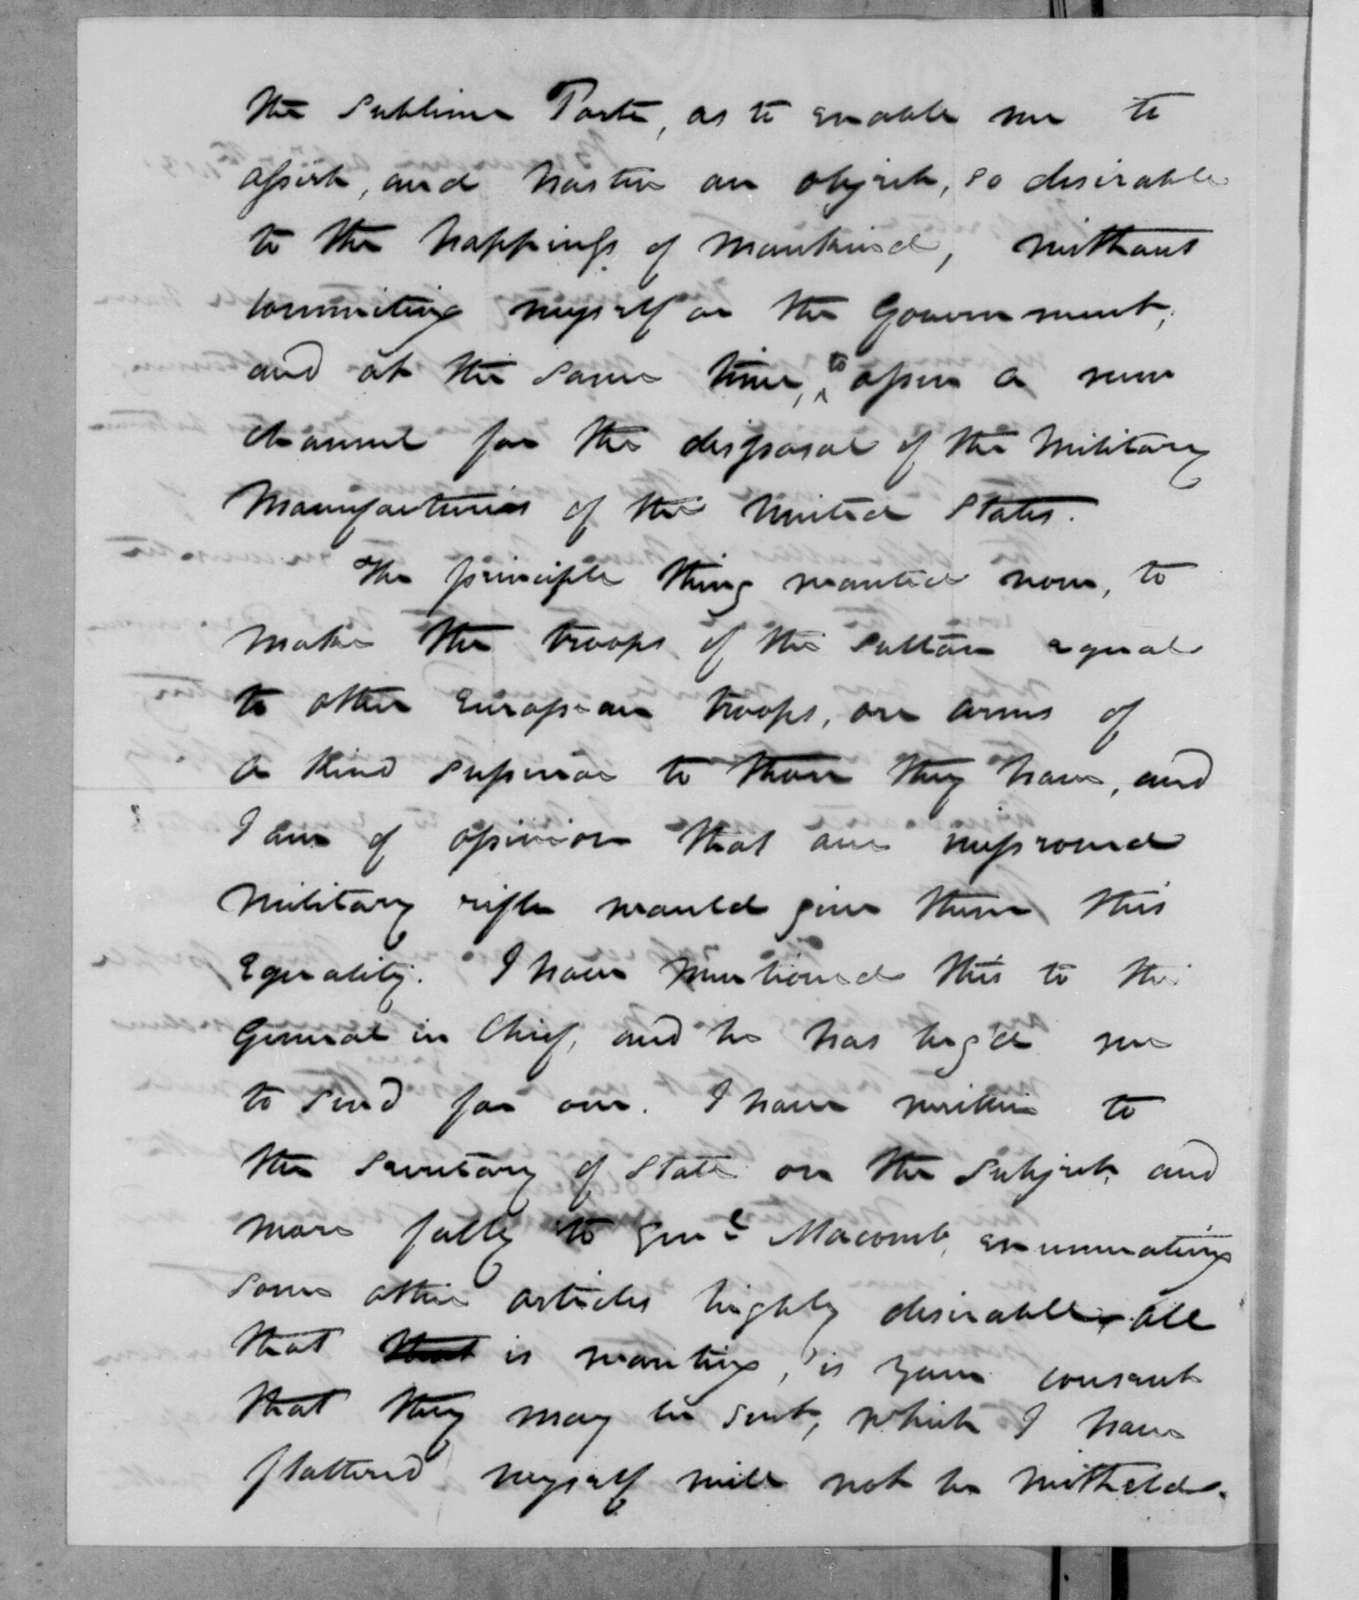 David Porter to Andrew Jackson, October 7, 1831